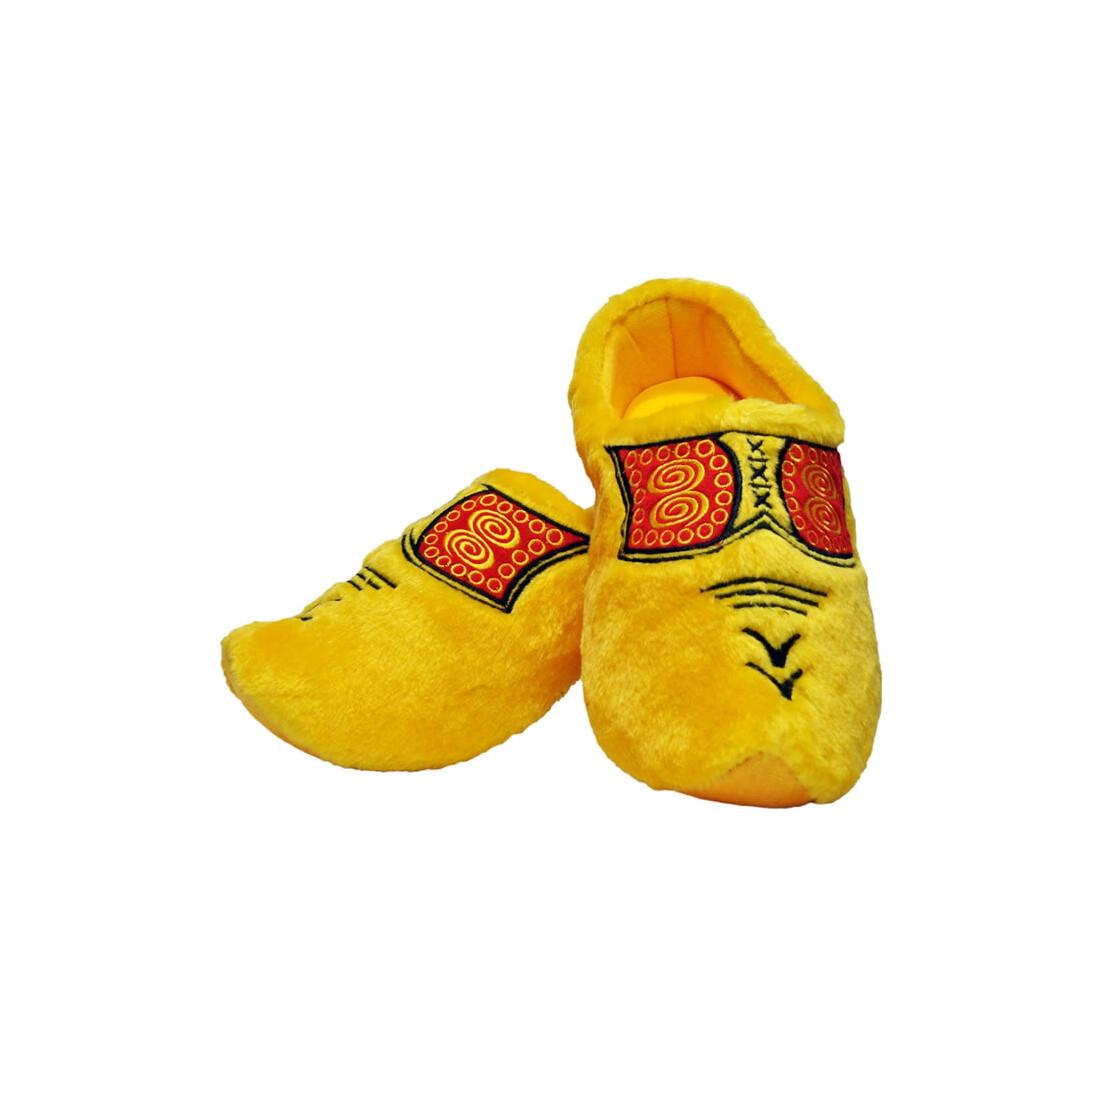 holland clogs holl ndische hausschuhe slippers gr e 46 47 19 99. Black Bedroom Furniture Sets. Home Design Ideas